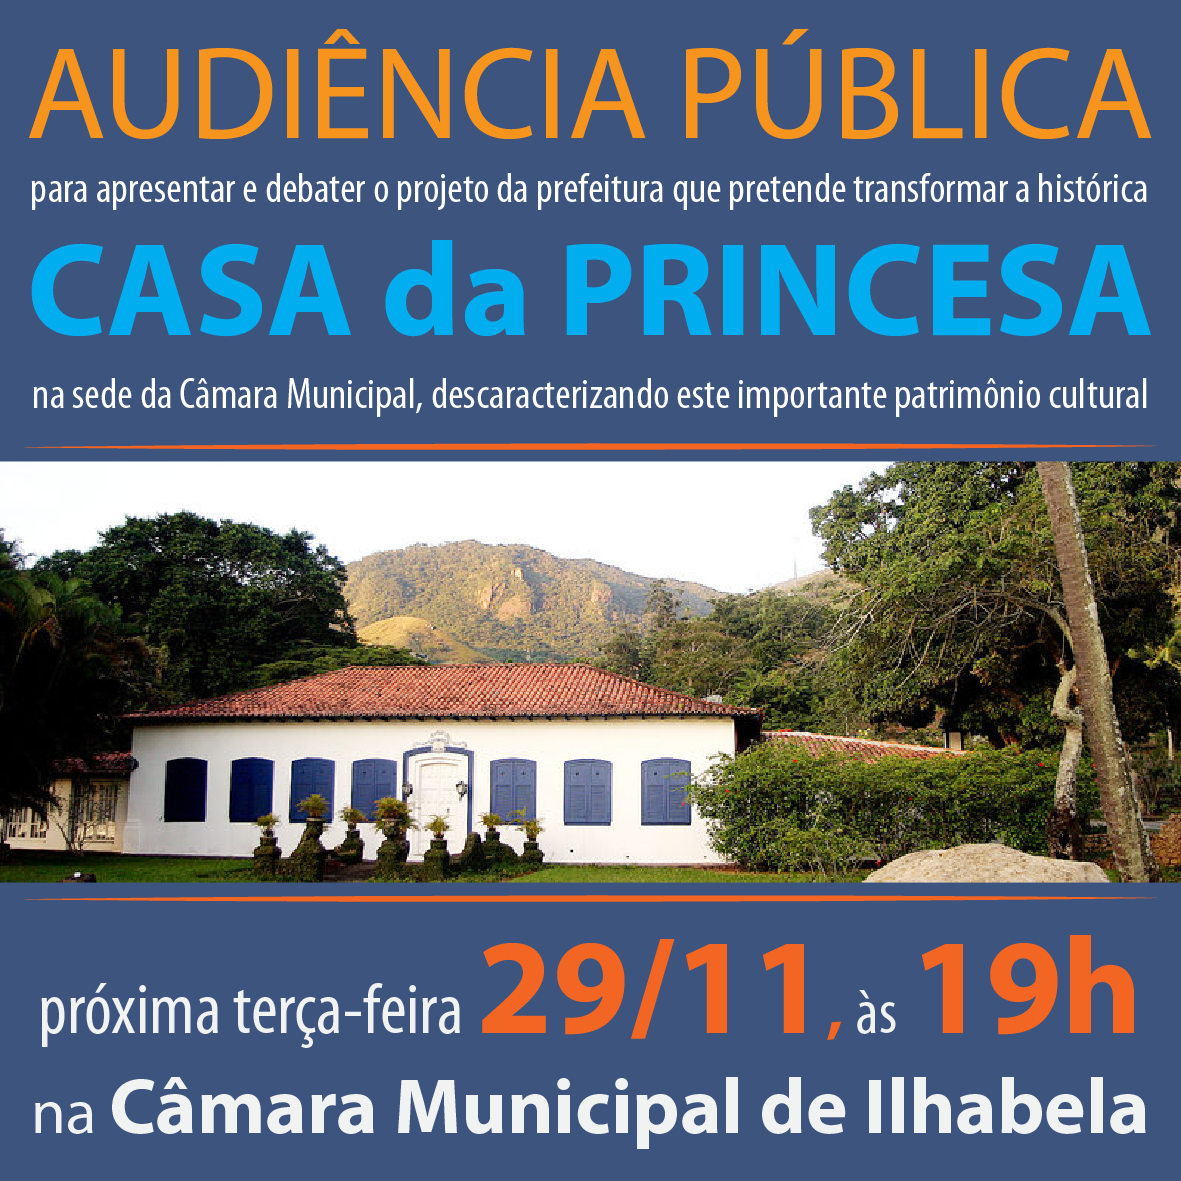 ap_casa_da_princesa-01